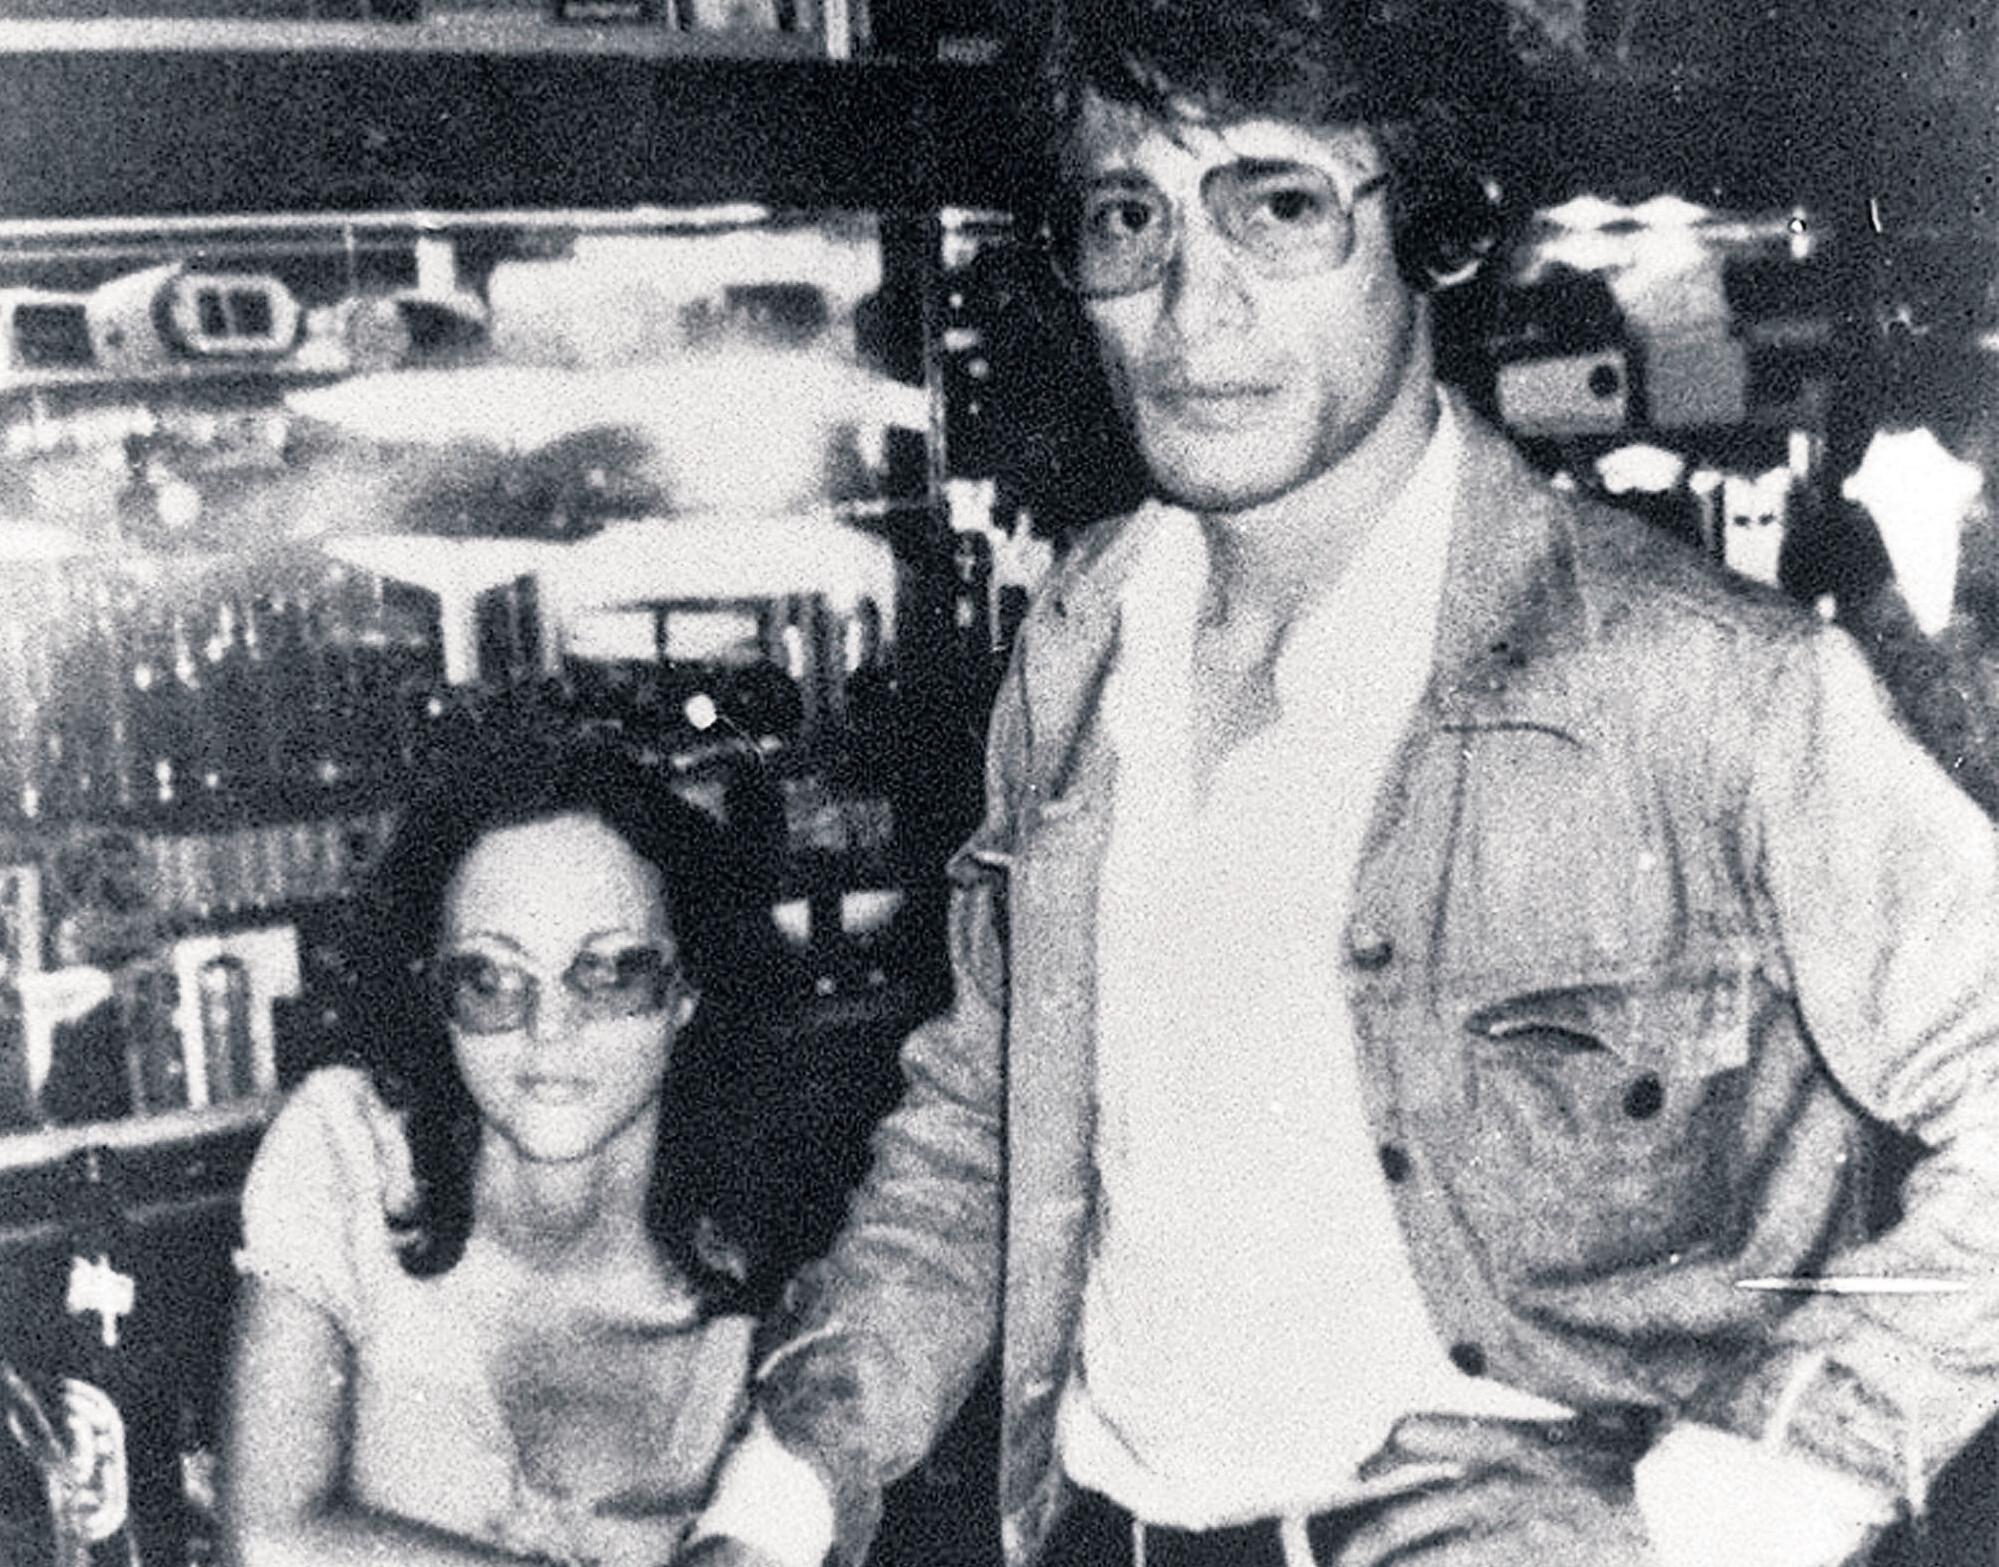 Marie-Andrée Leclerc & Charles Sobhraj